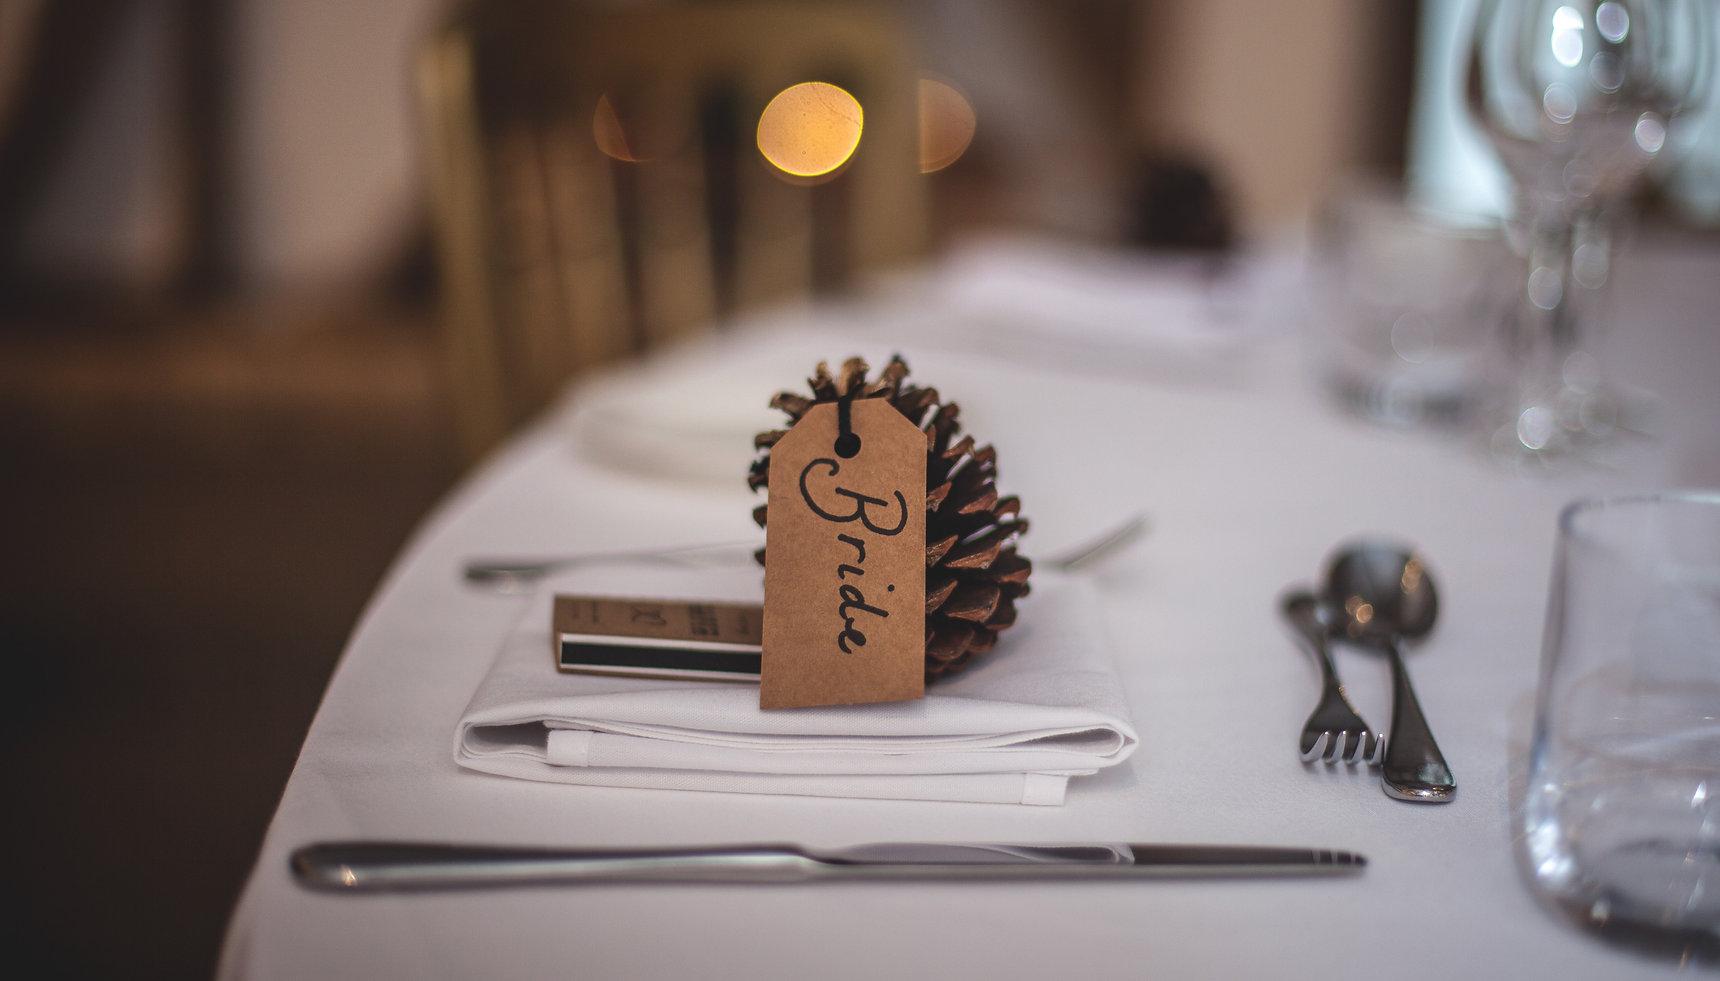 acorn-blur-business-175765.jpg